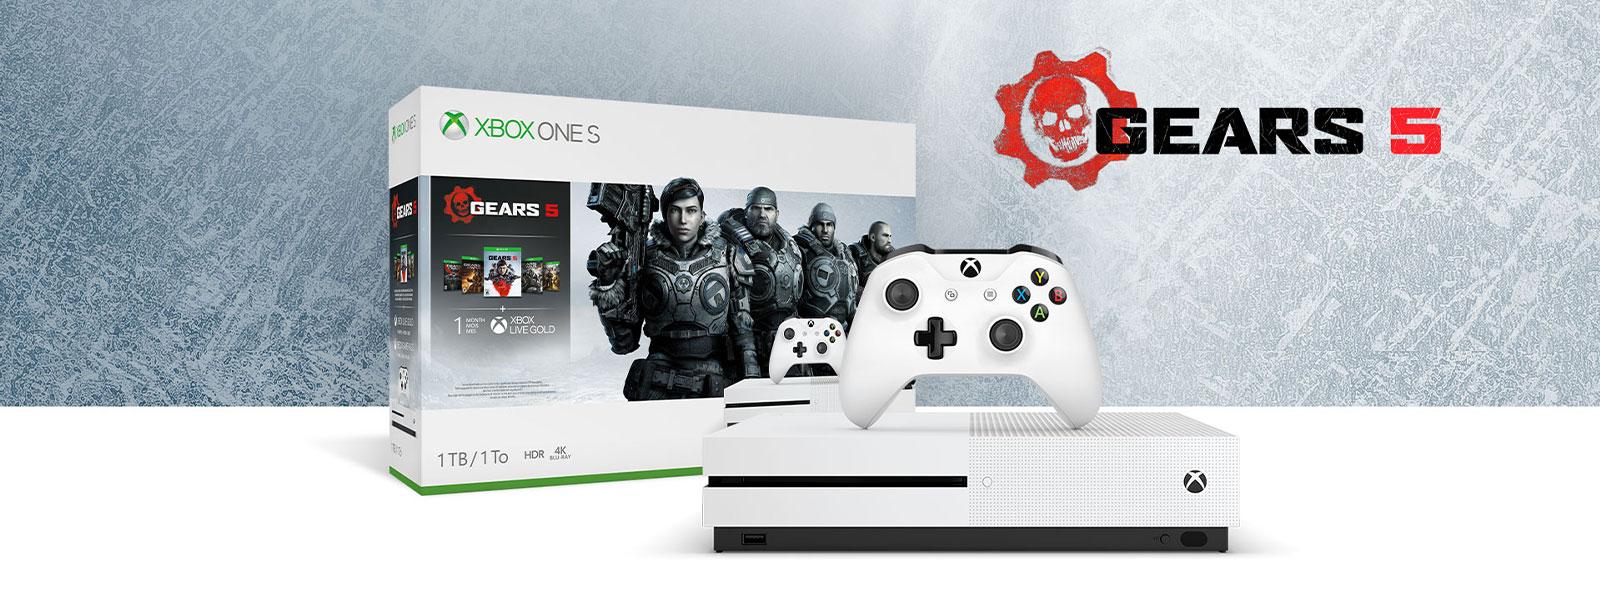 Комплект Xbox One S с игрой Gears 5 на фоне ледяной текстуры